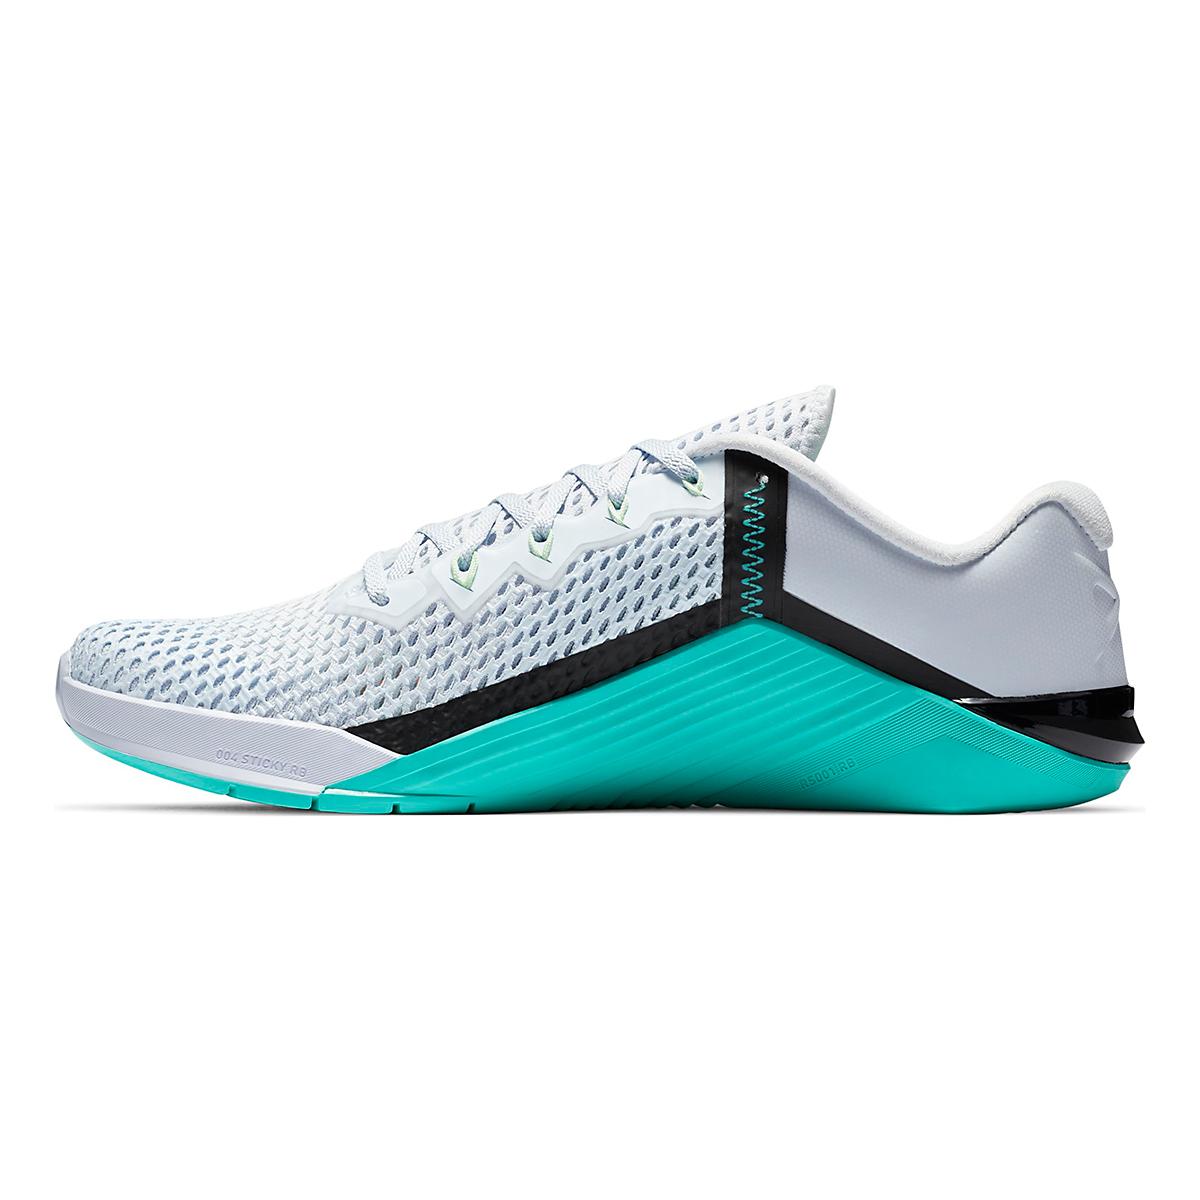 Men's Nike Nike Metcon 6 Training Shoes - Color: Football Grey/Hyper Jade/Black/Flash Crimson - Size: 3.5 - Width: Regular, Football Grey/Hyper Jade/Black/Flash Crimson, large, image 2